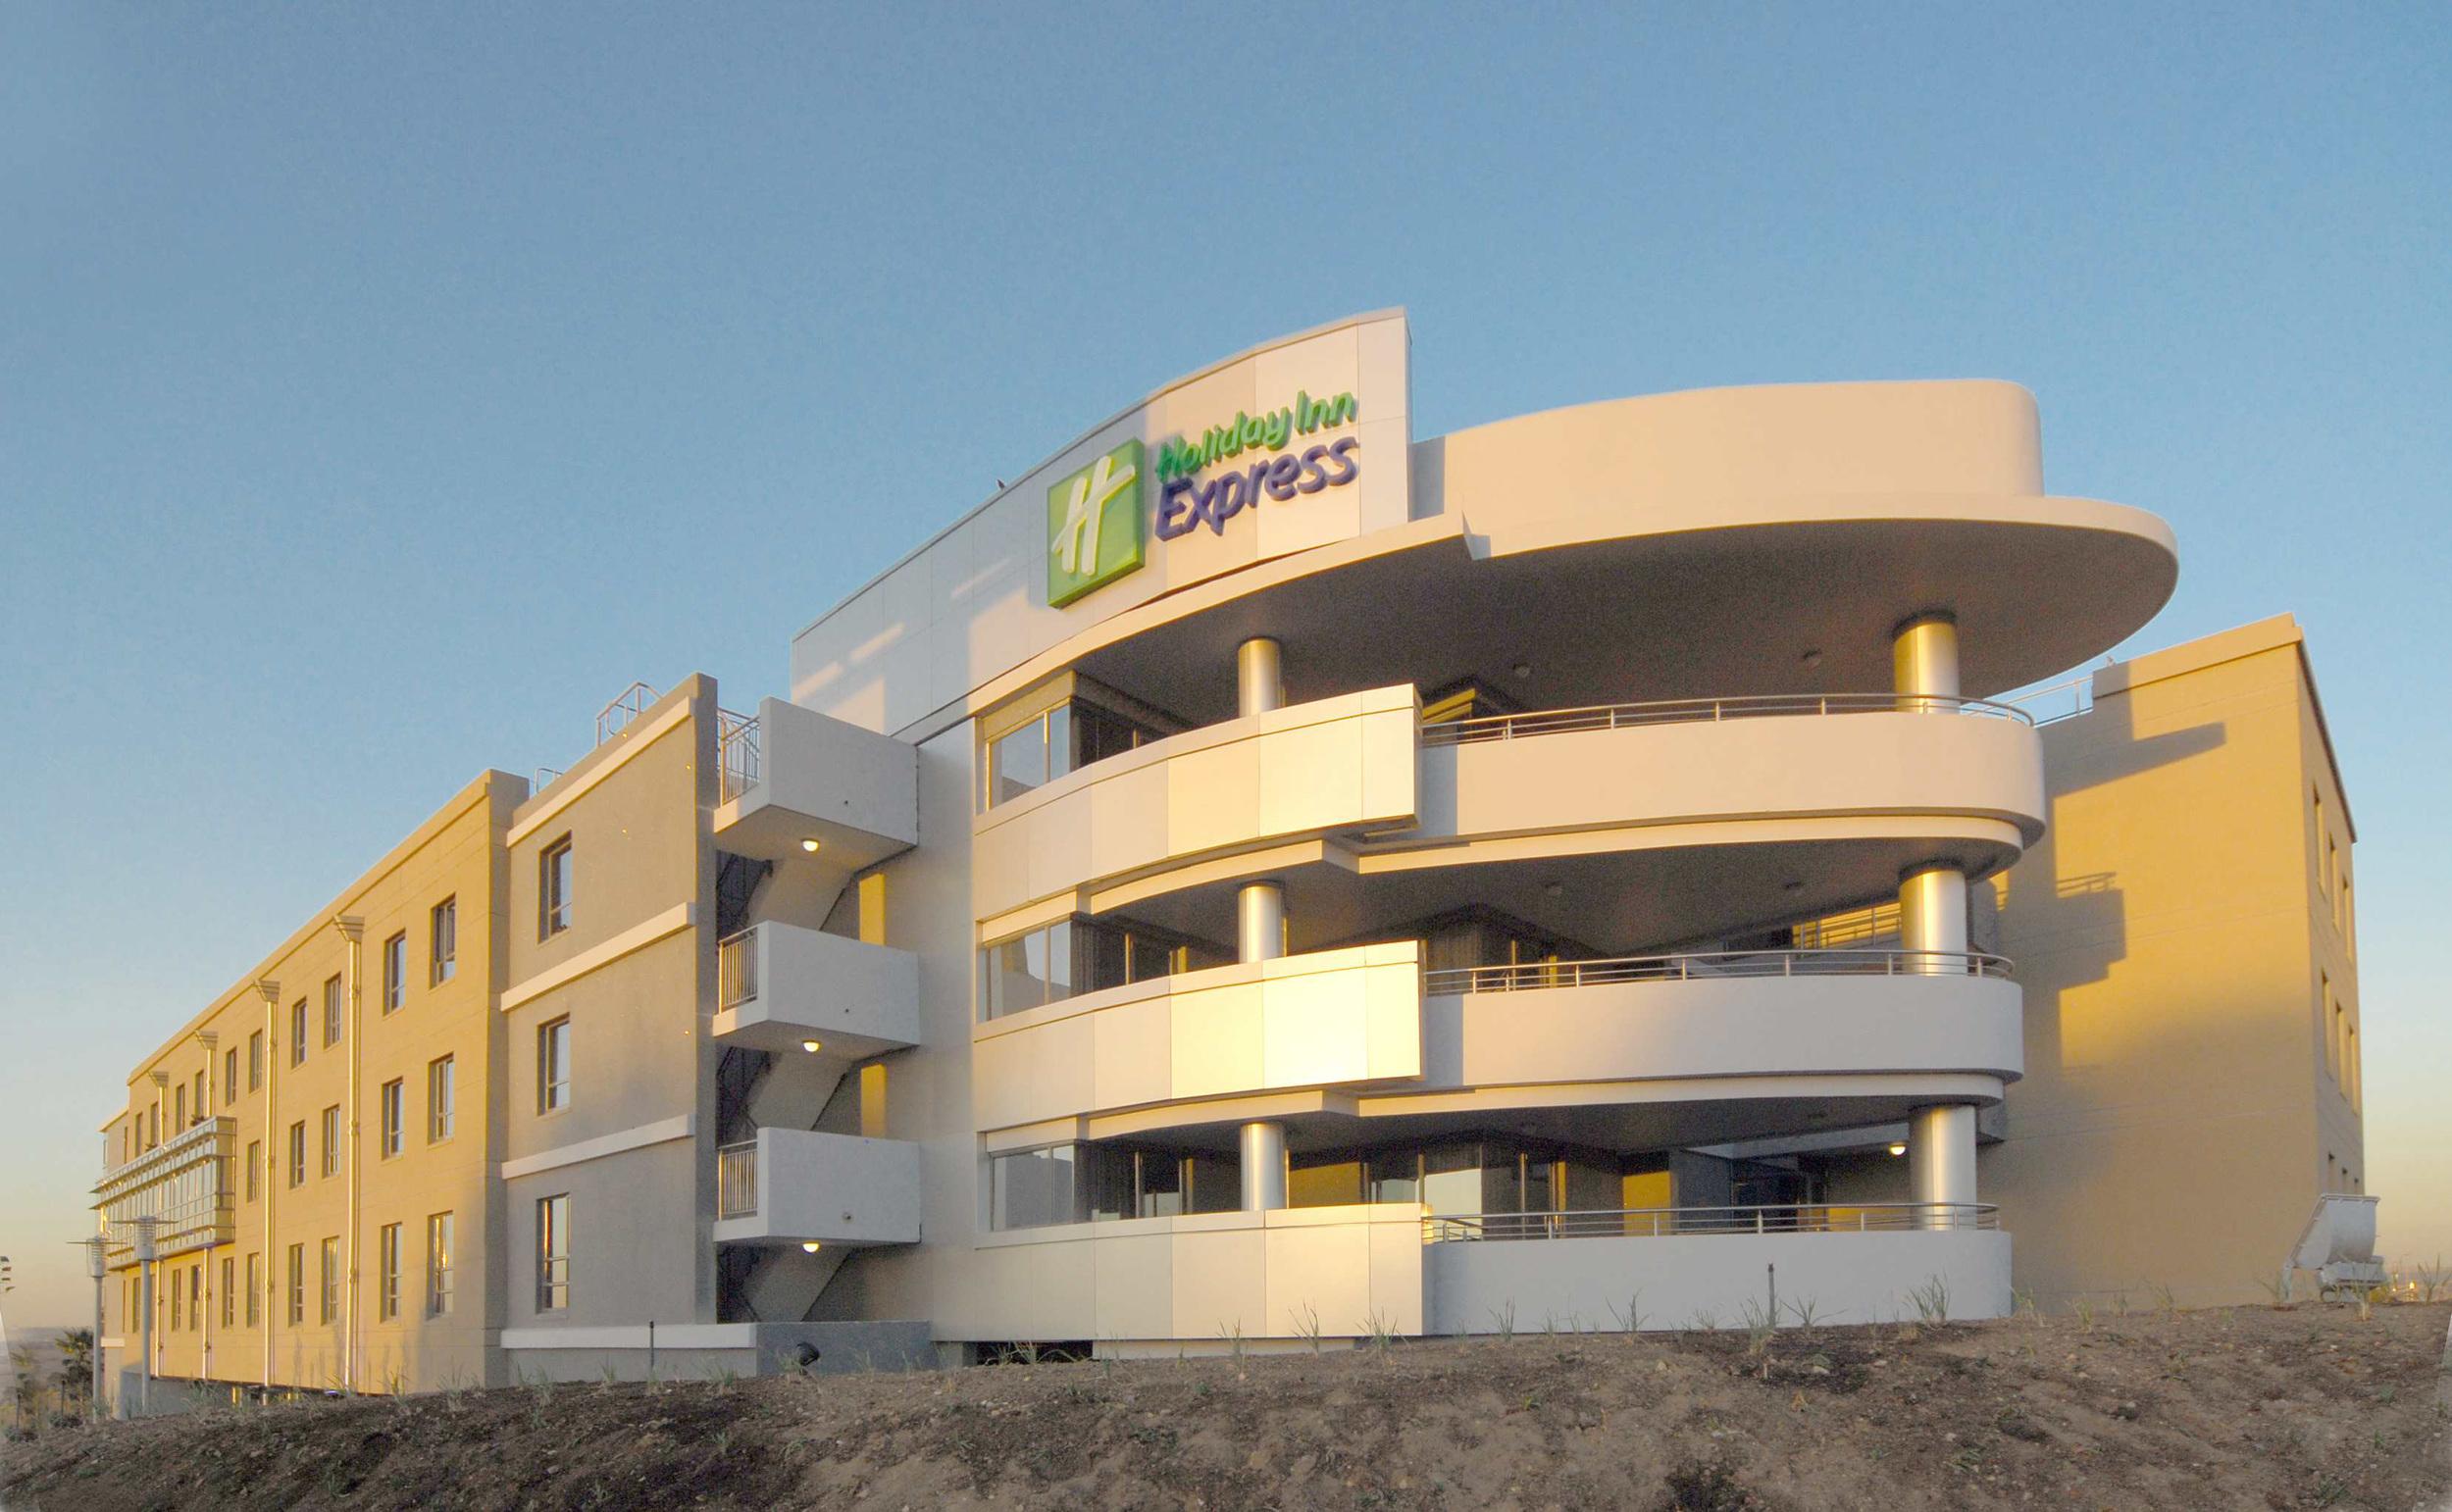 hotels-holiday inn express woodmead.jpg